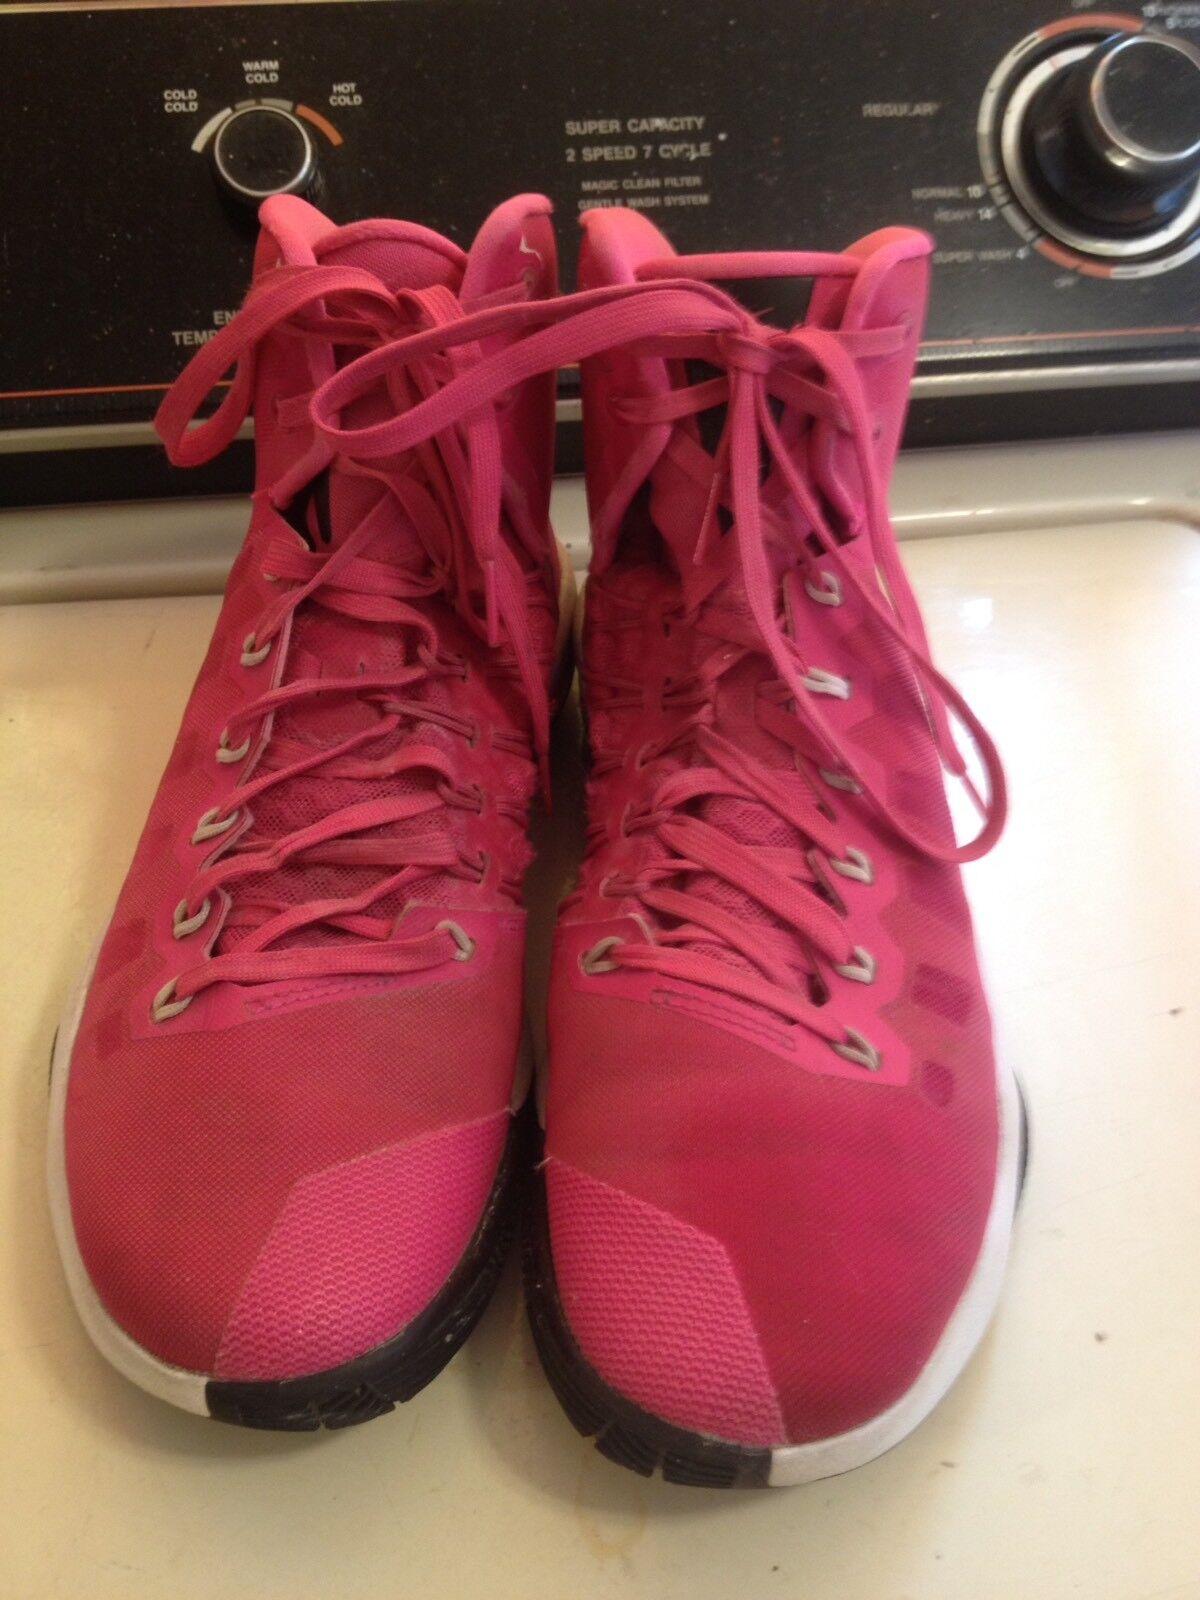 Nike Hyperdunk Zoom Breast Cancer Pink Mens 8 844359-660 (b33)